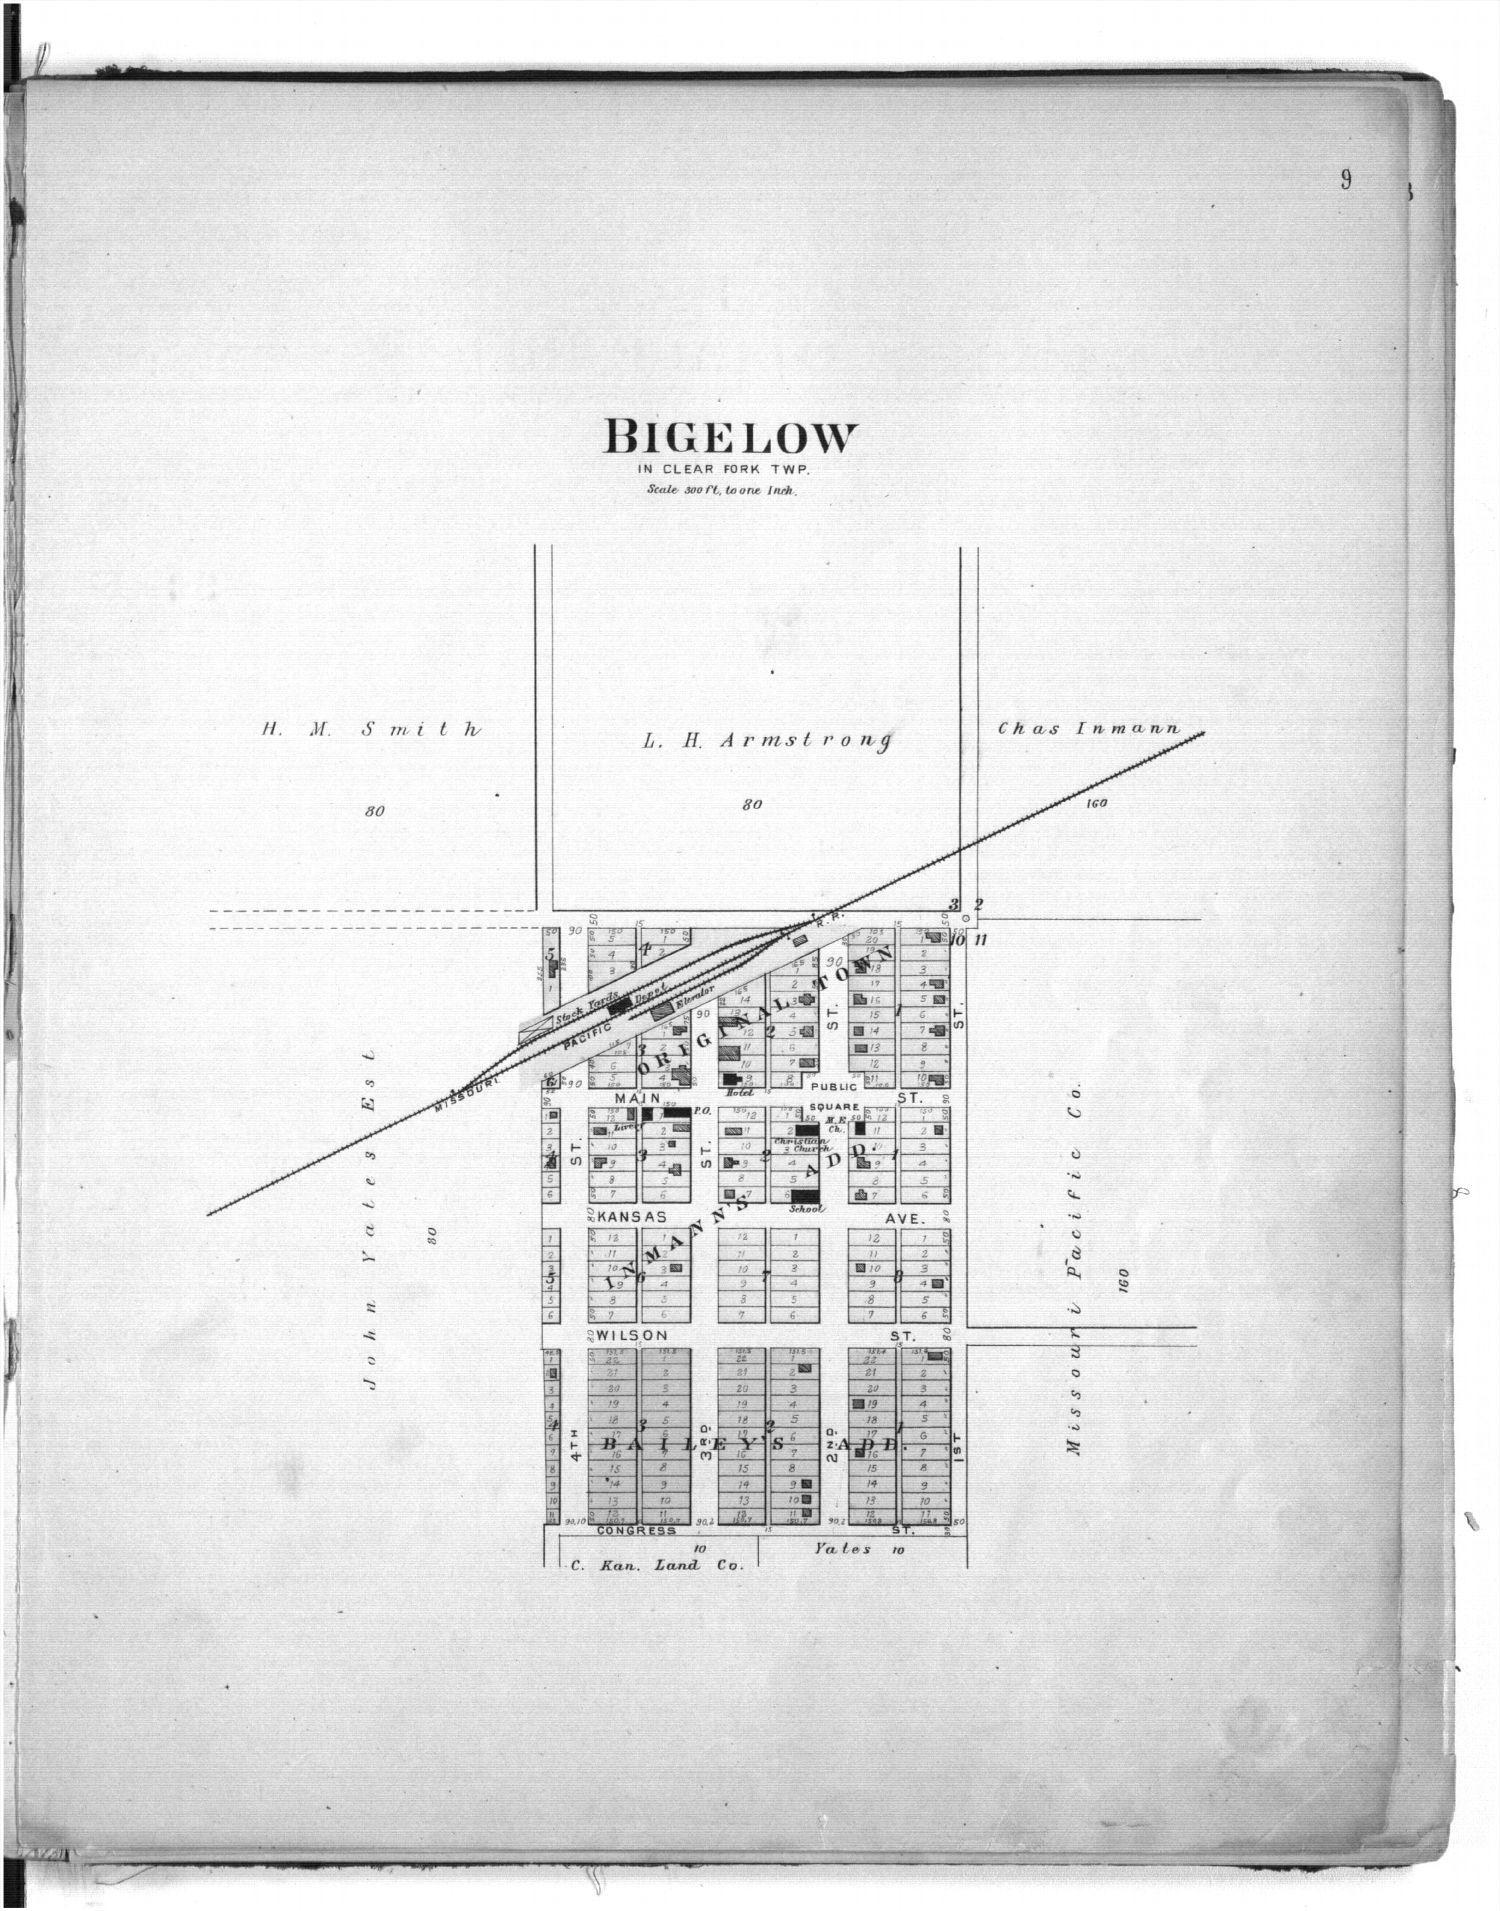 Plat book of Marshall County, Kansas - 9